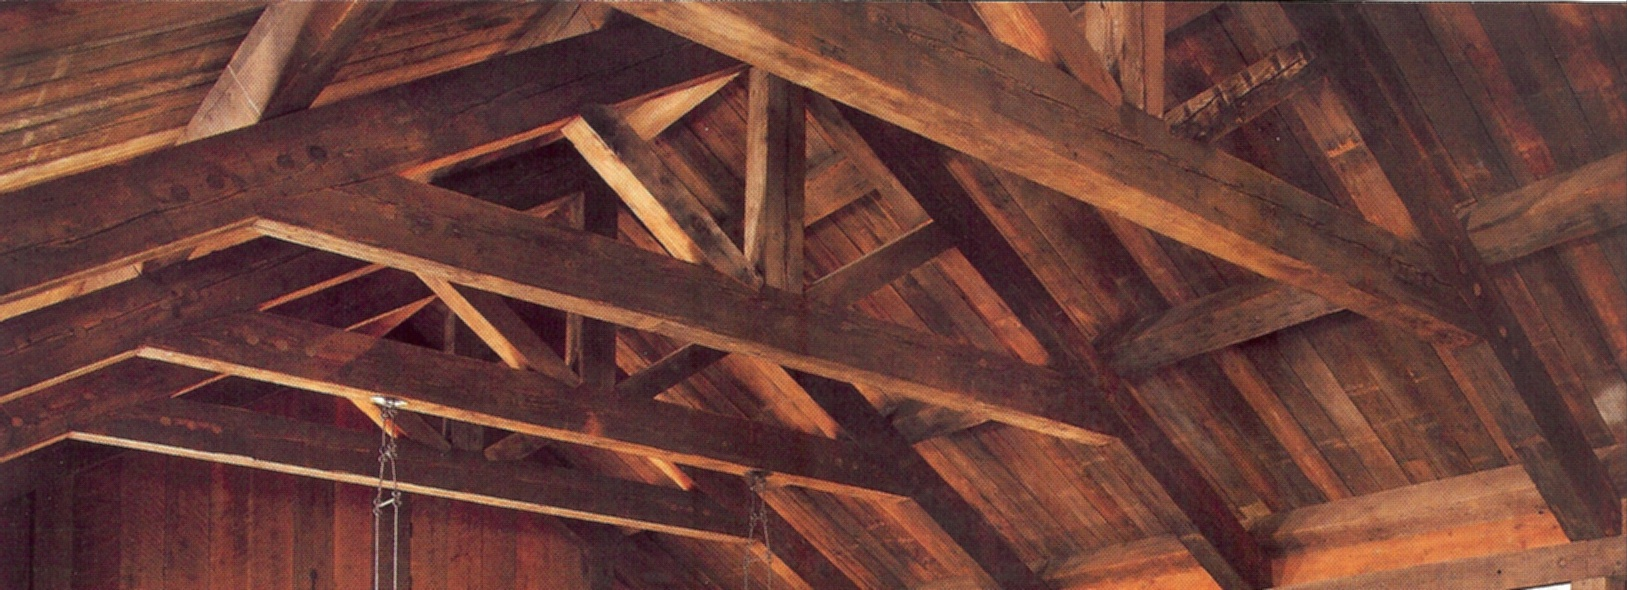 https://www.ignifugari-stingatoare.ro/wp-content/uploads/2020/09/timbers-wood-beams.jpg